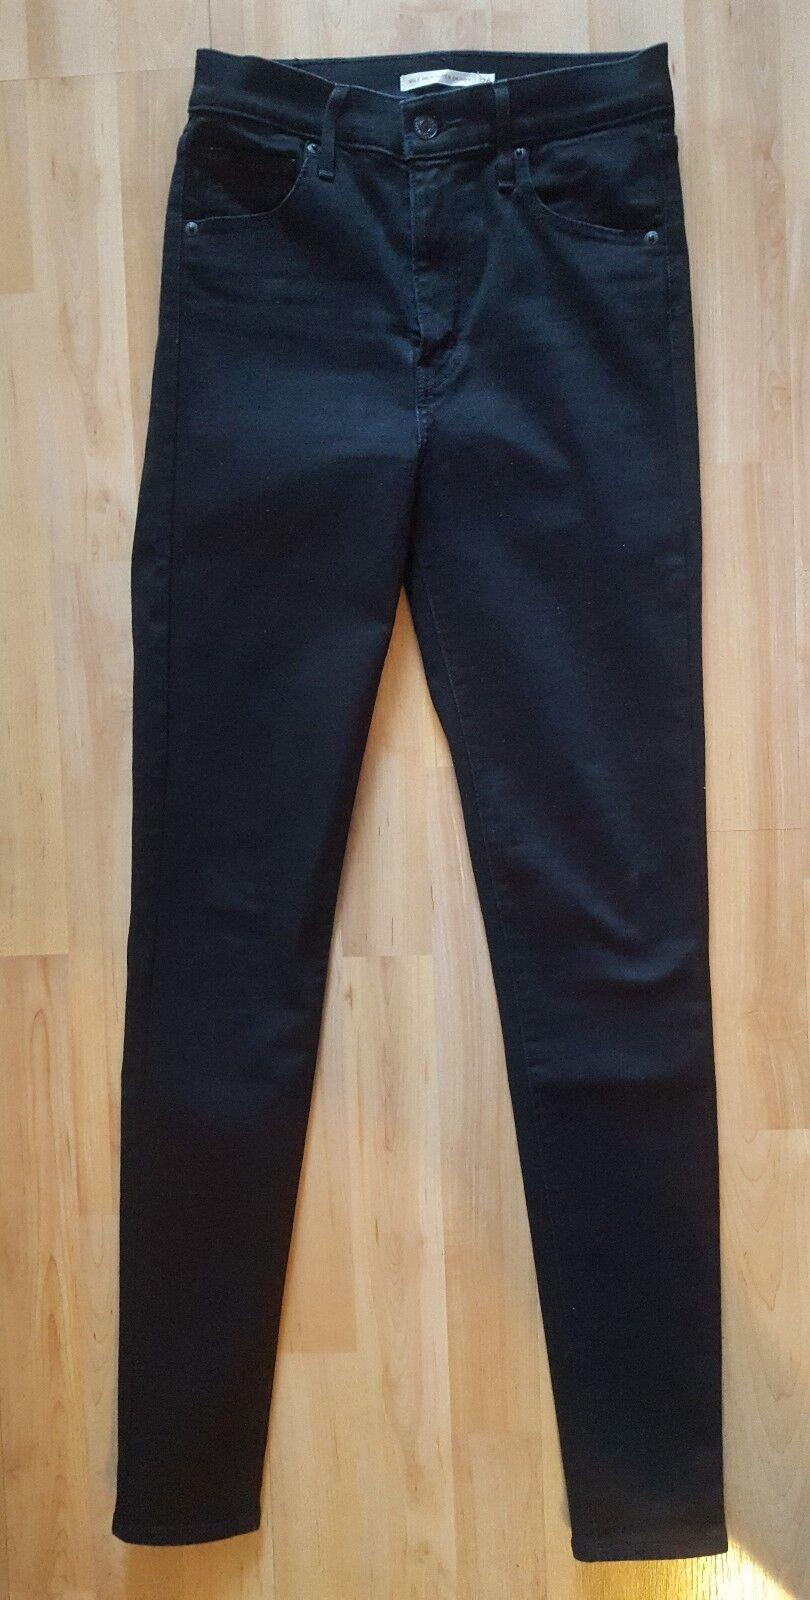 Damen Jeans Mile High Super Skinny Schwarz Gr. 26 30 NEU